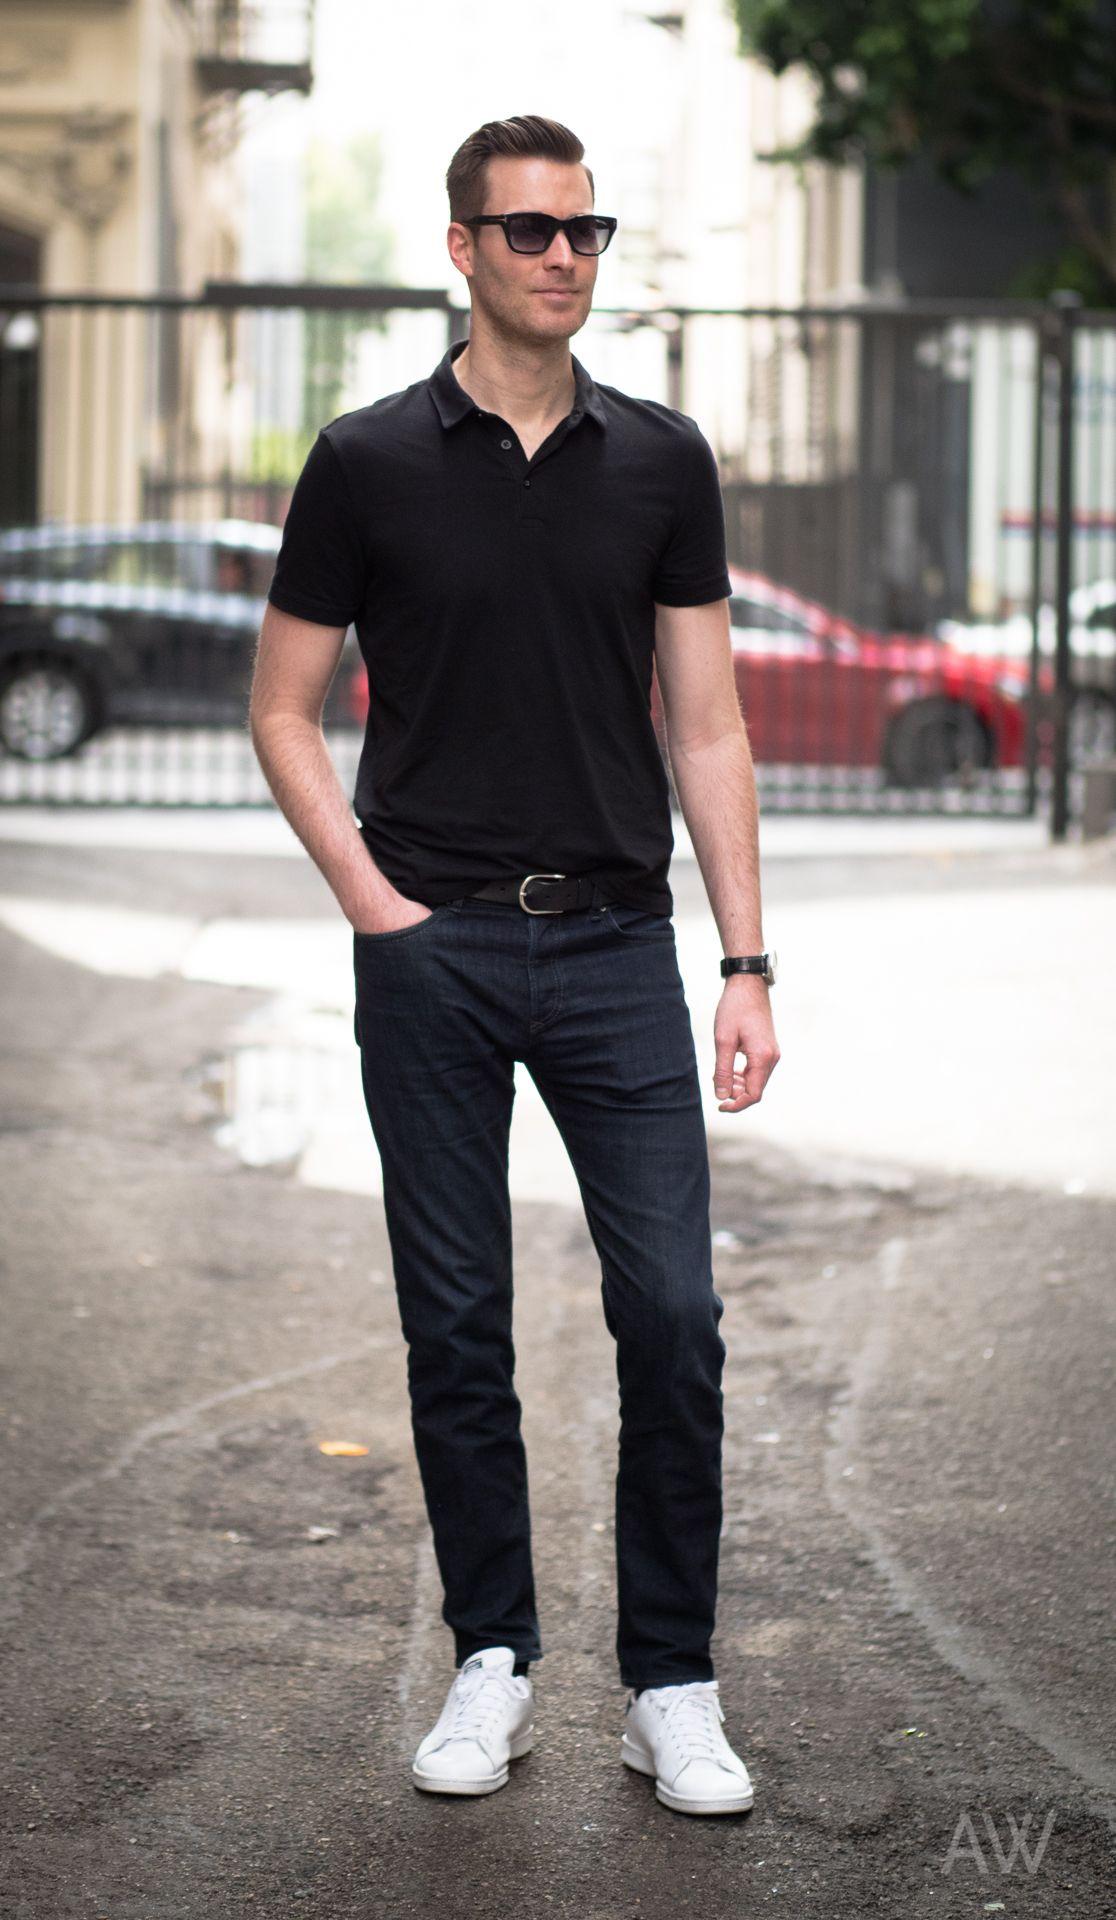 2019 year lifestyle- Stylish mens polo shirts